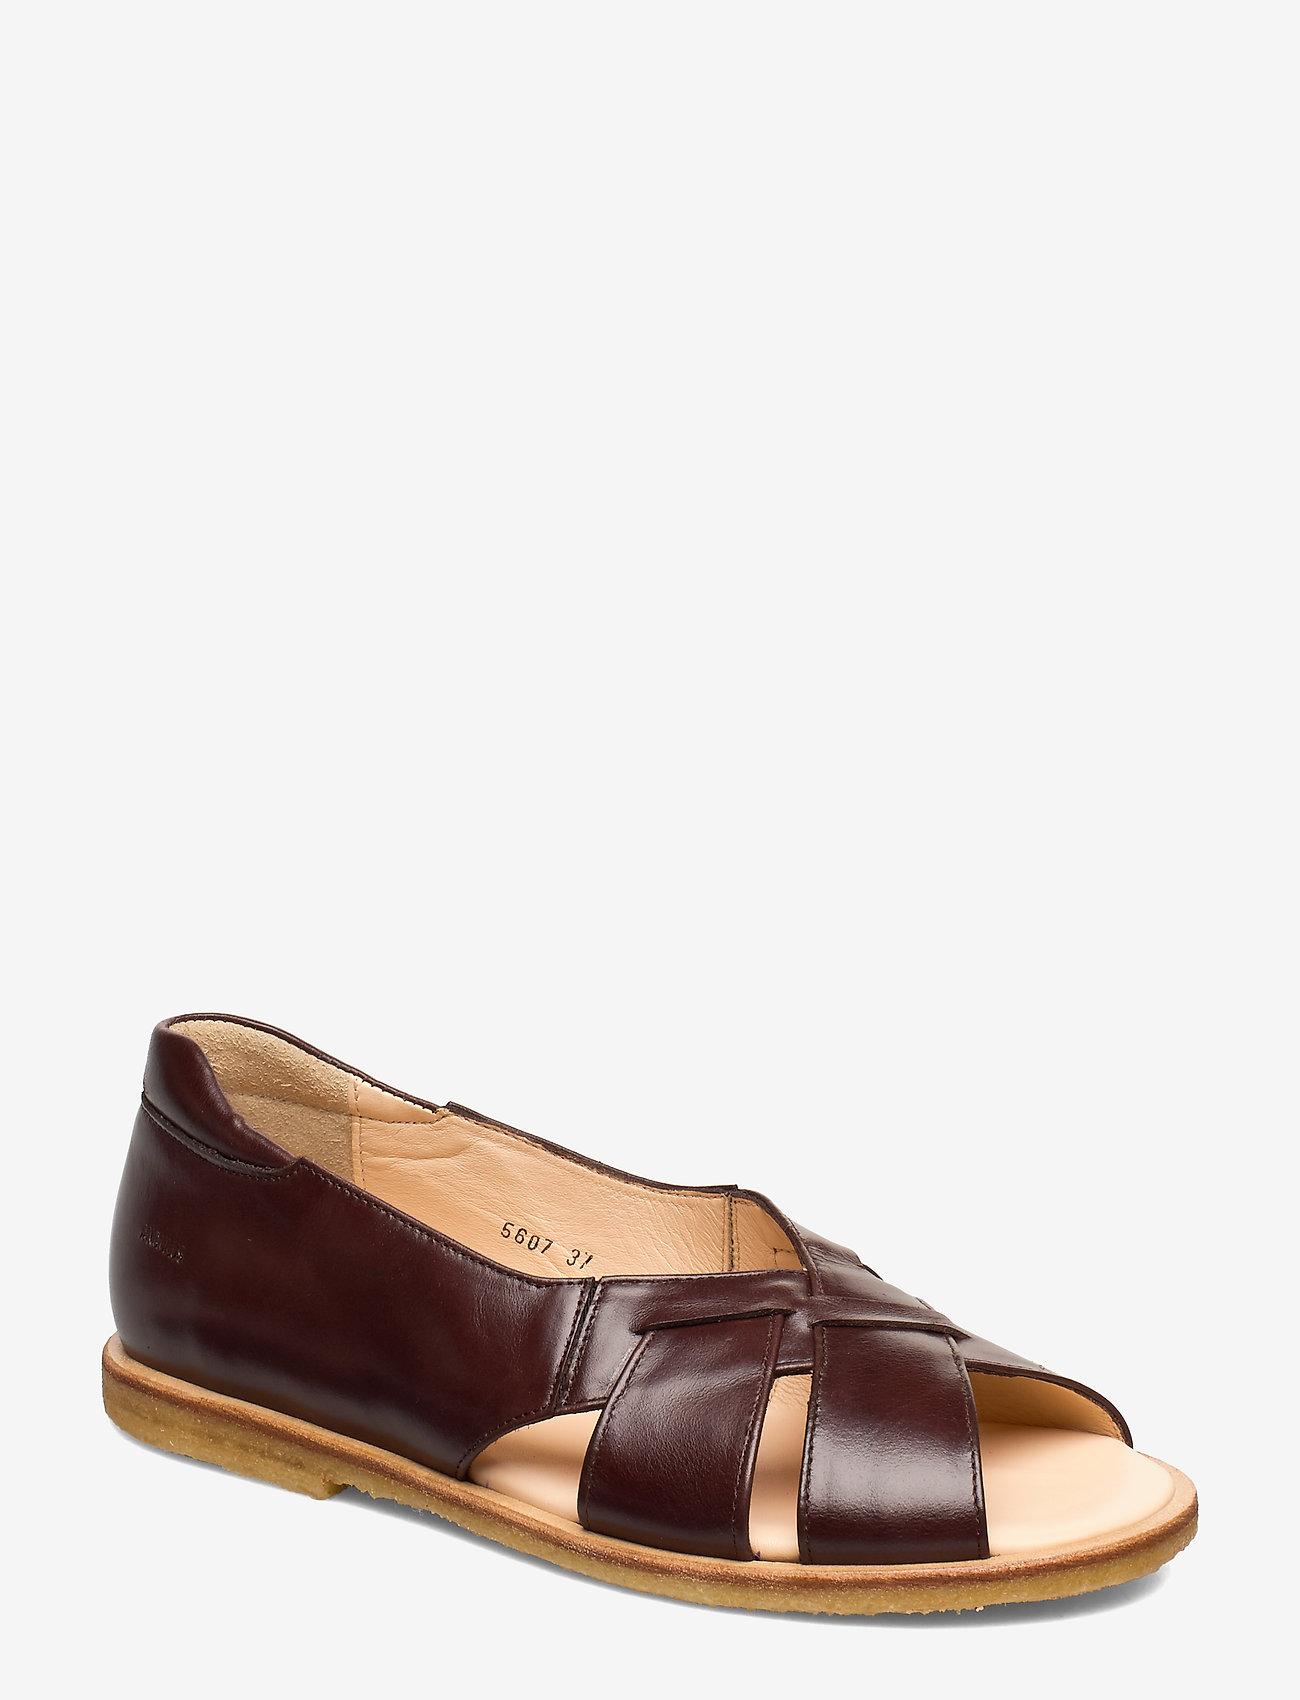 ANGULUS - Sandals - flat - open toe - op - platta sandaler - 1836/002 dark brown/dark brown - 0